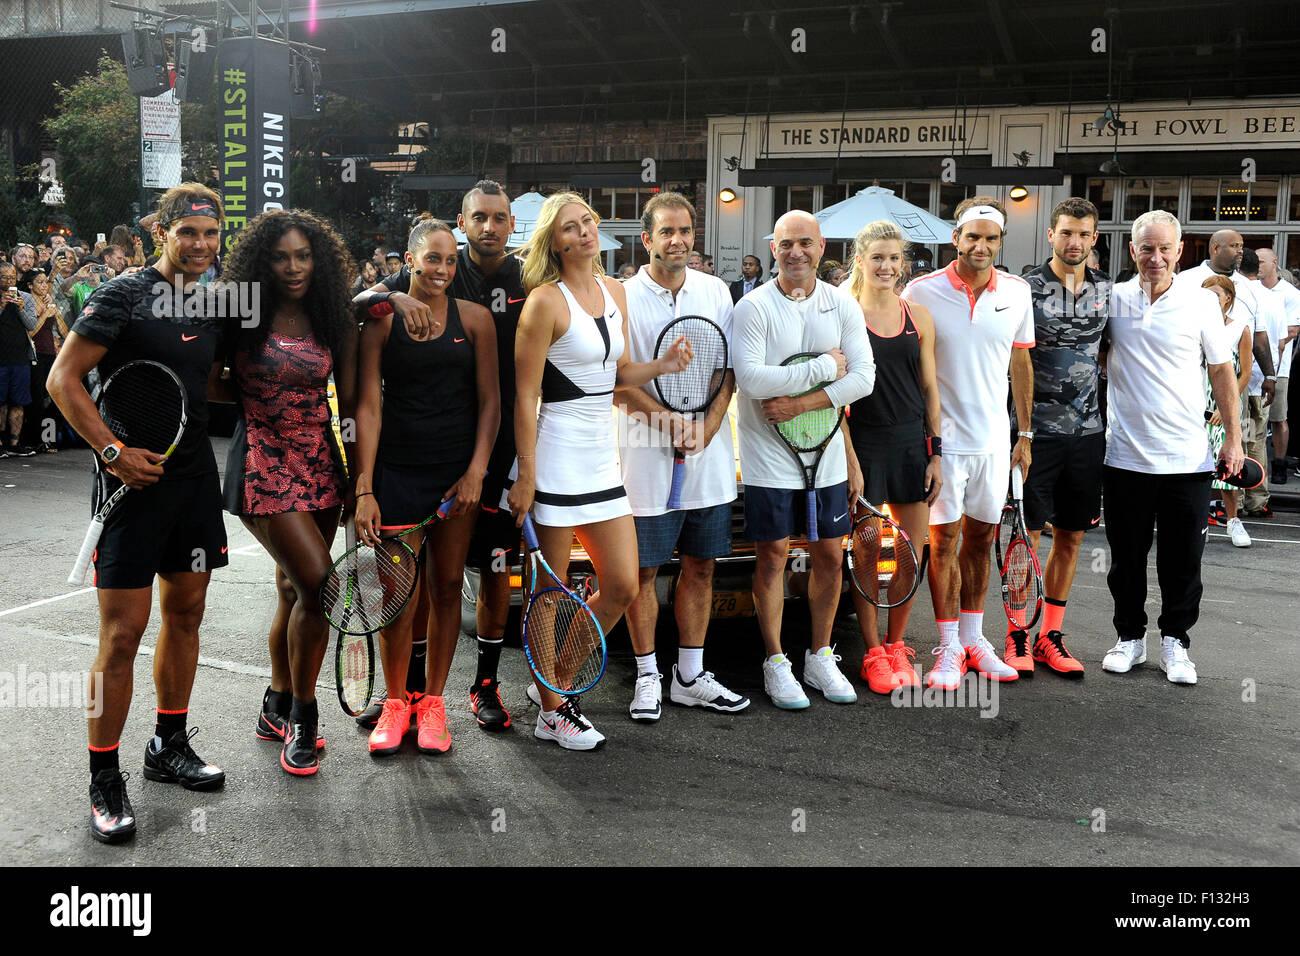 newest 28fe2 421f1 Tennis players Rafael Nadal, Serena Williams, Madison Keys, Nick Kyrgious,  Maria Sharapova, Pete Sampras, Andre Agassi, Genie Bouchard, Roger Federer,  ...